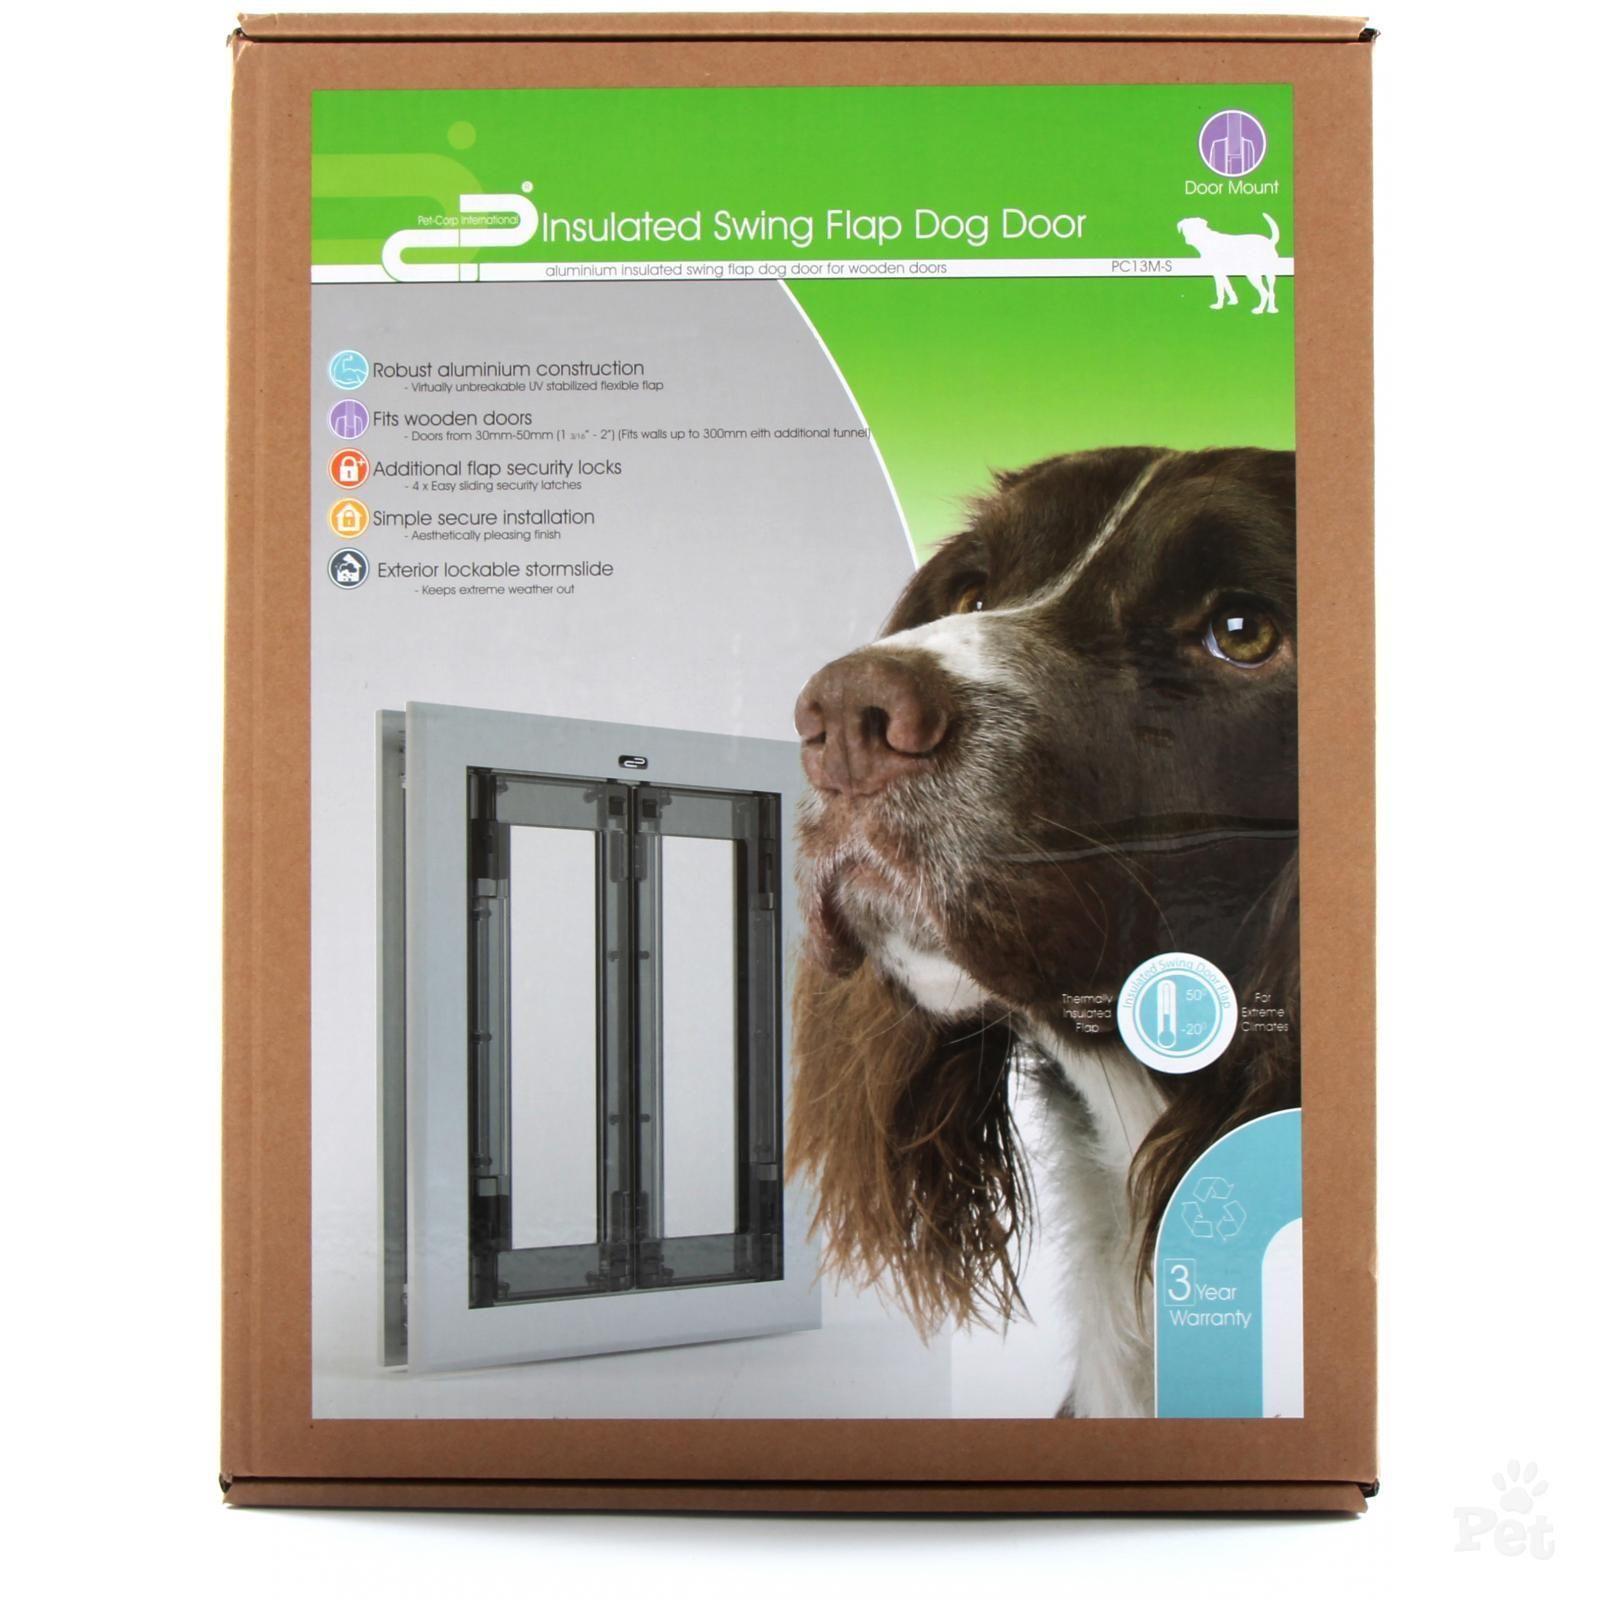 Pet Corp Insulated Swing Flap Dog Door Dogs Pinterest Dog